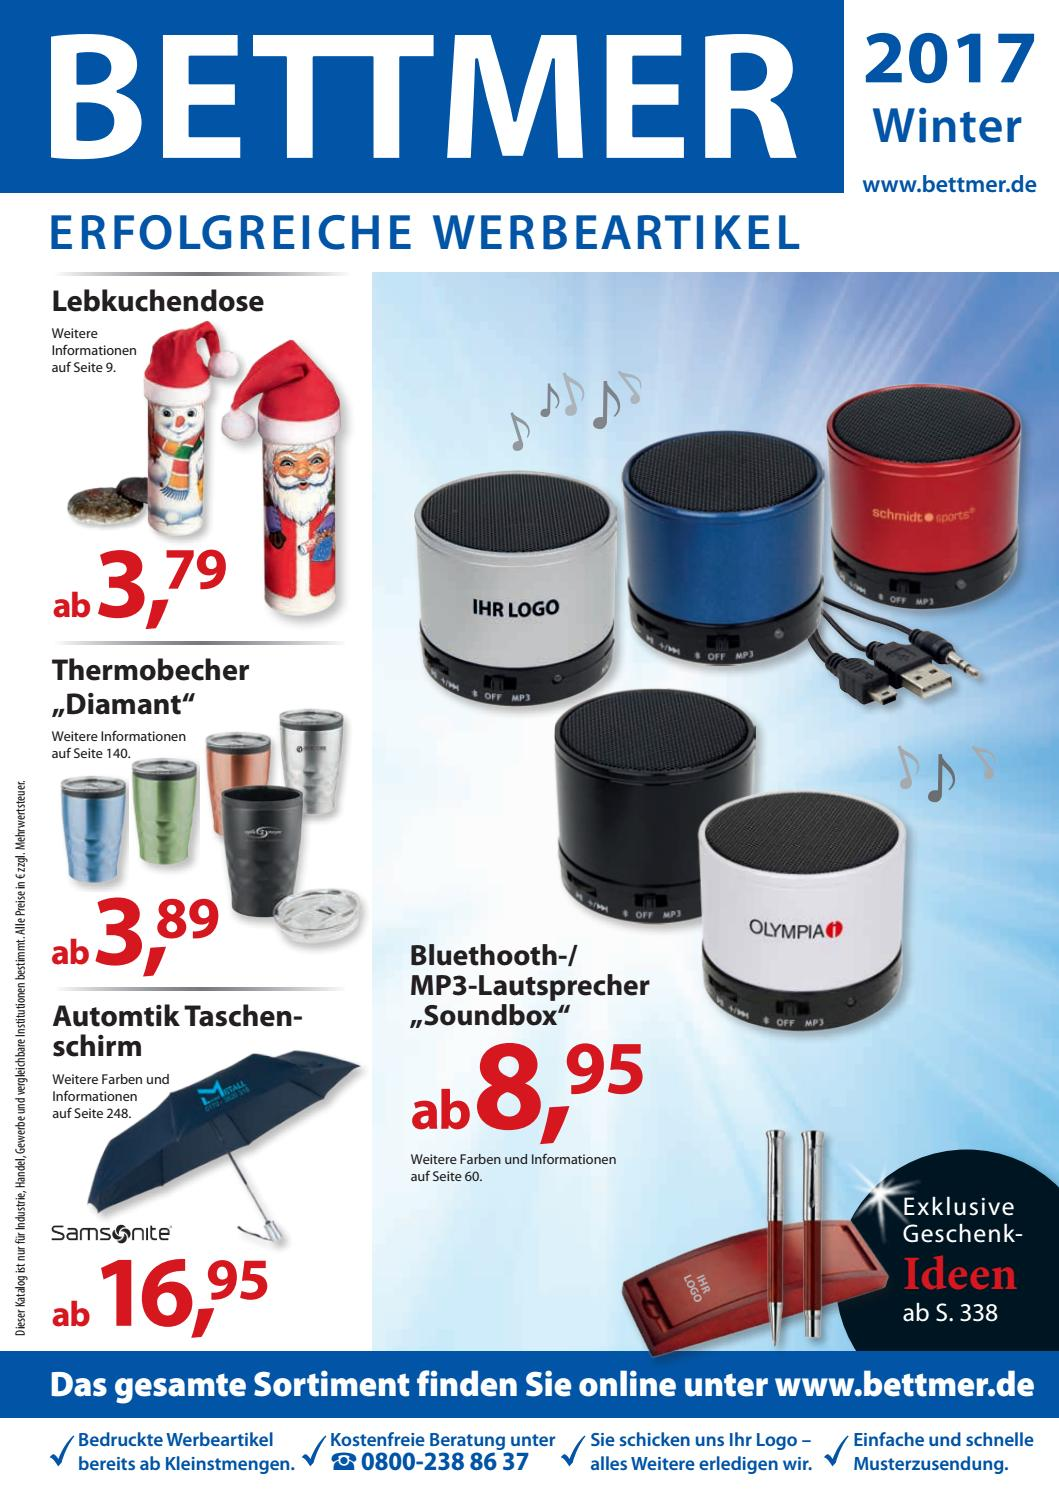 by Katalog 2017 Bettmer GmbH issuu BETTMER Winter doEQrBCeWx